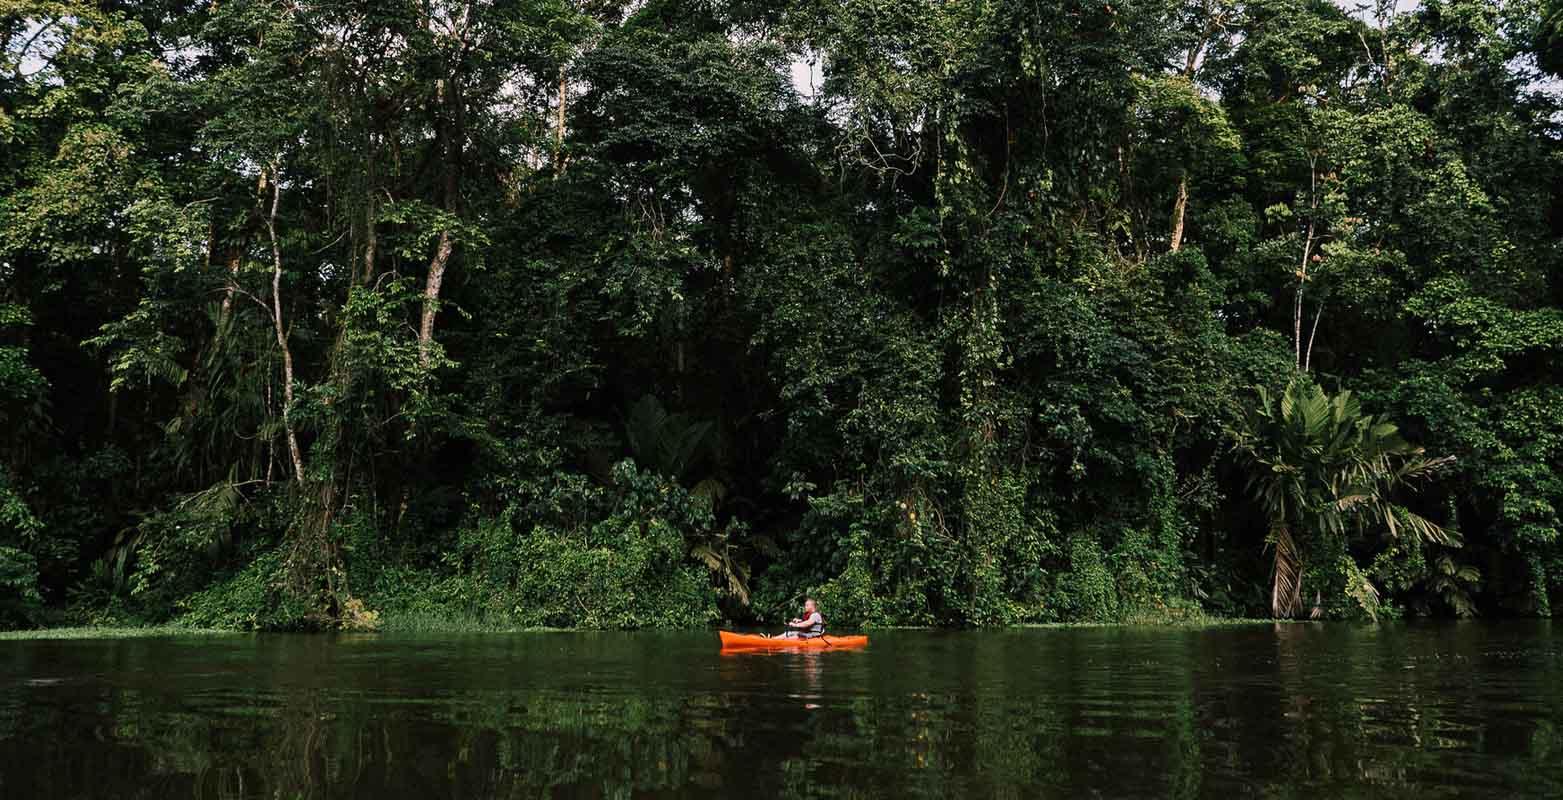 mawamba_lodge-_0003_kayak1.jpg